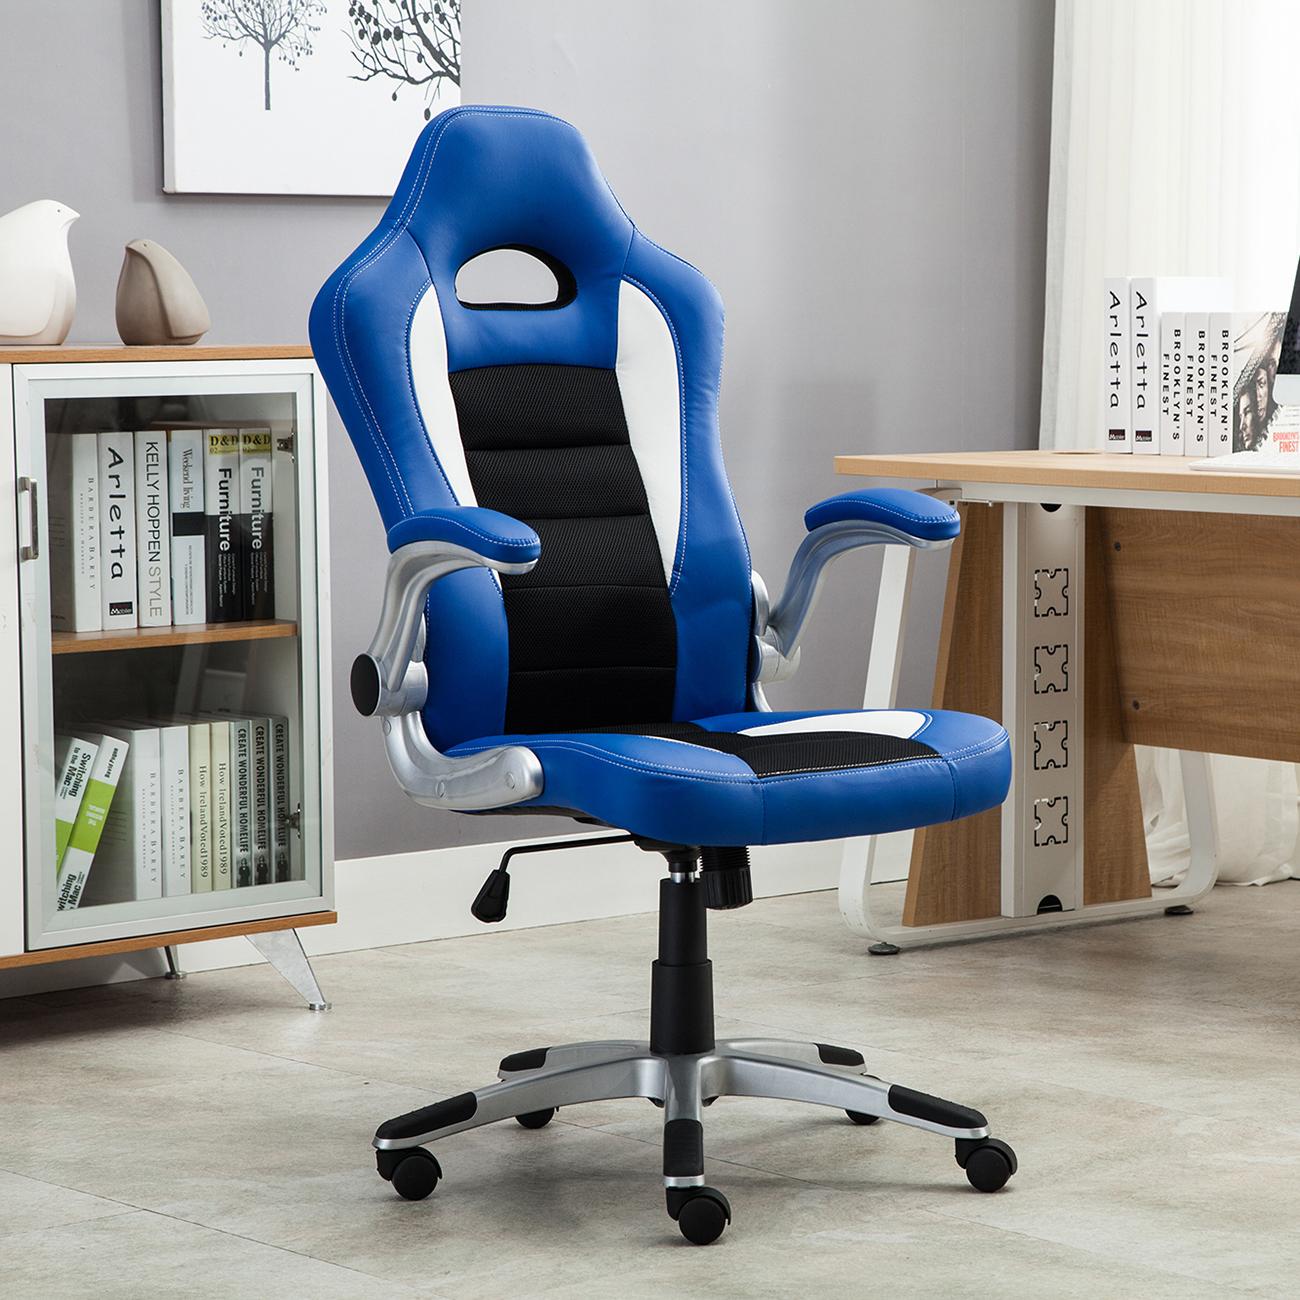 Office Chair Ergonomic Computer Pu Leather Desk Race